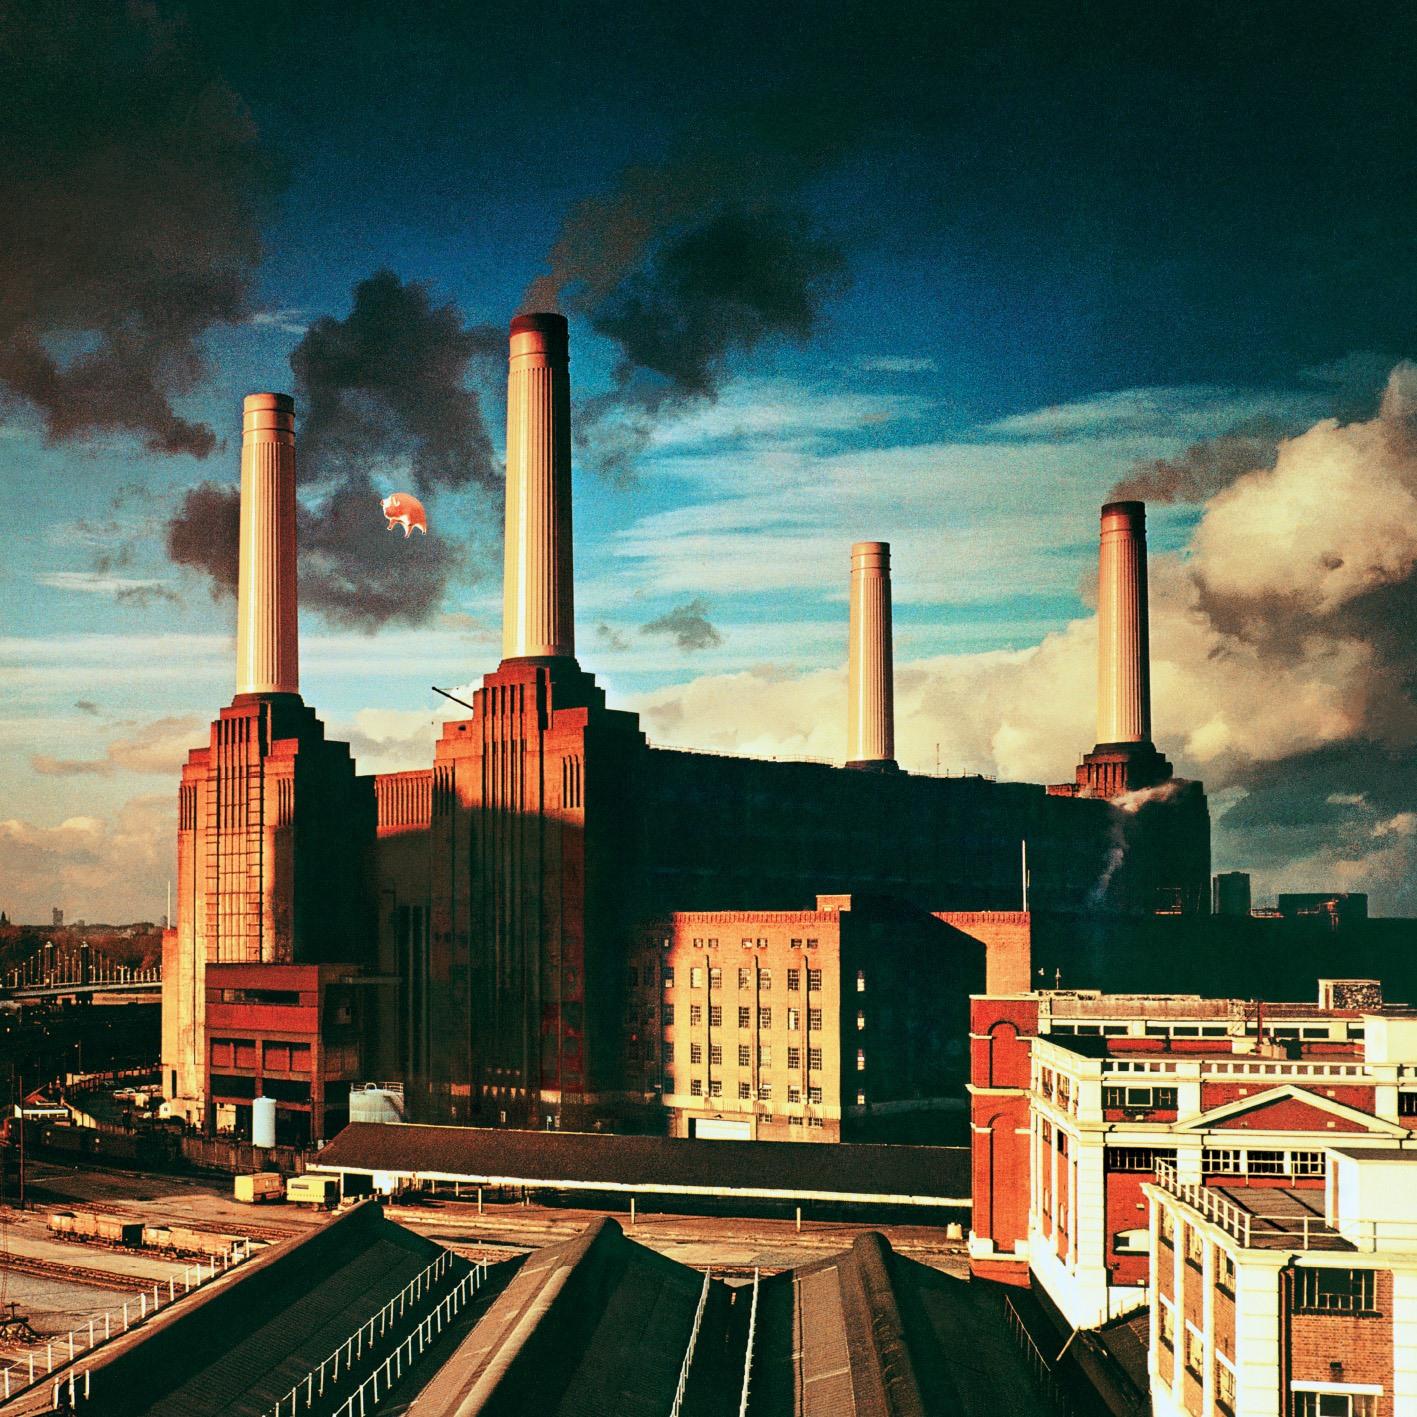 Animals © Pink Floyd Music Ltd